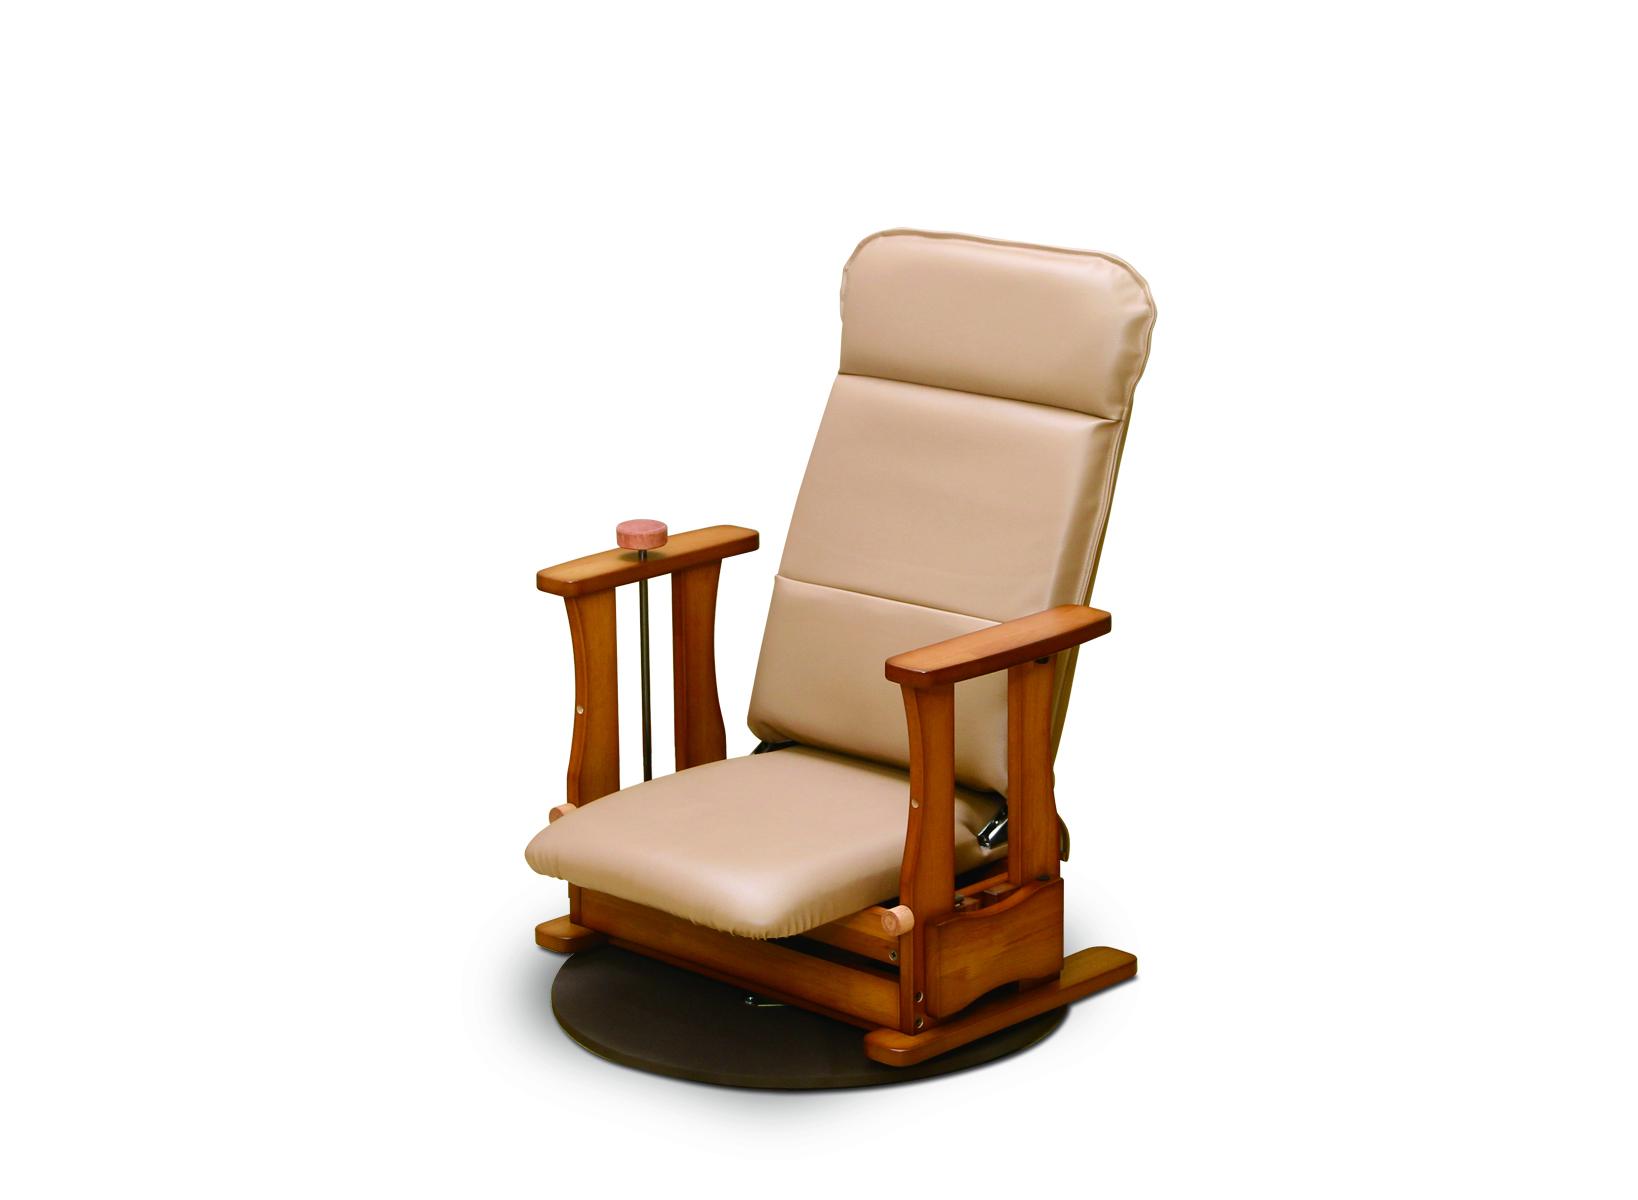 [NK-2028]起立補助椅子 ロ-タイプDX 回転付き